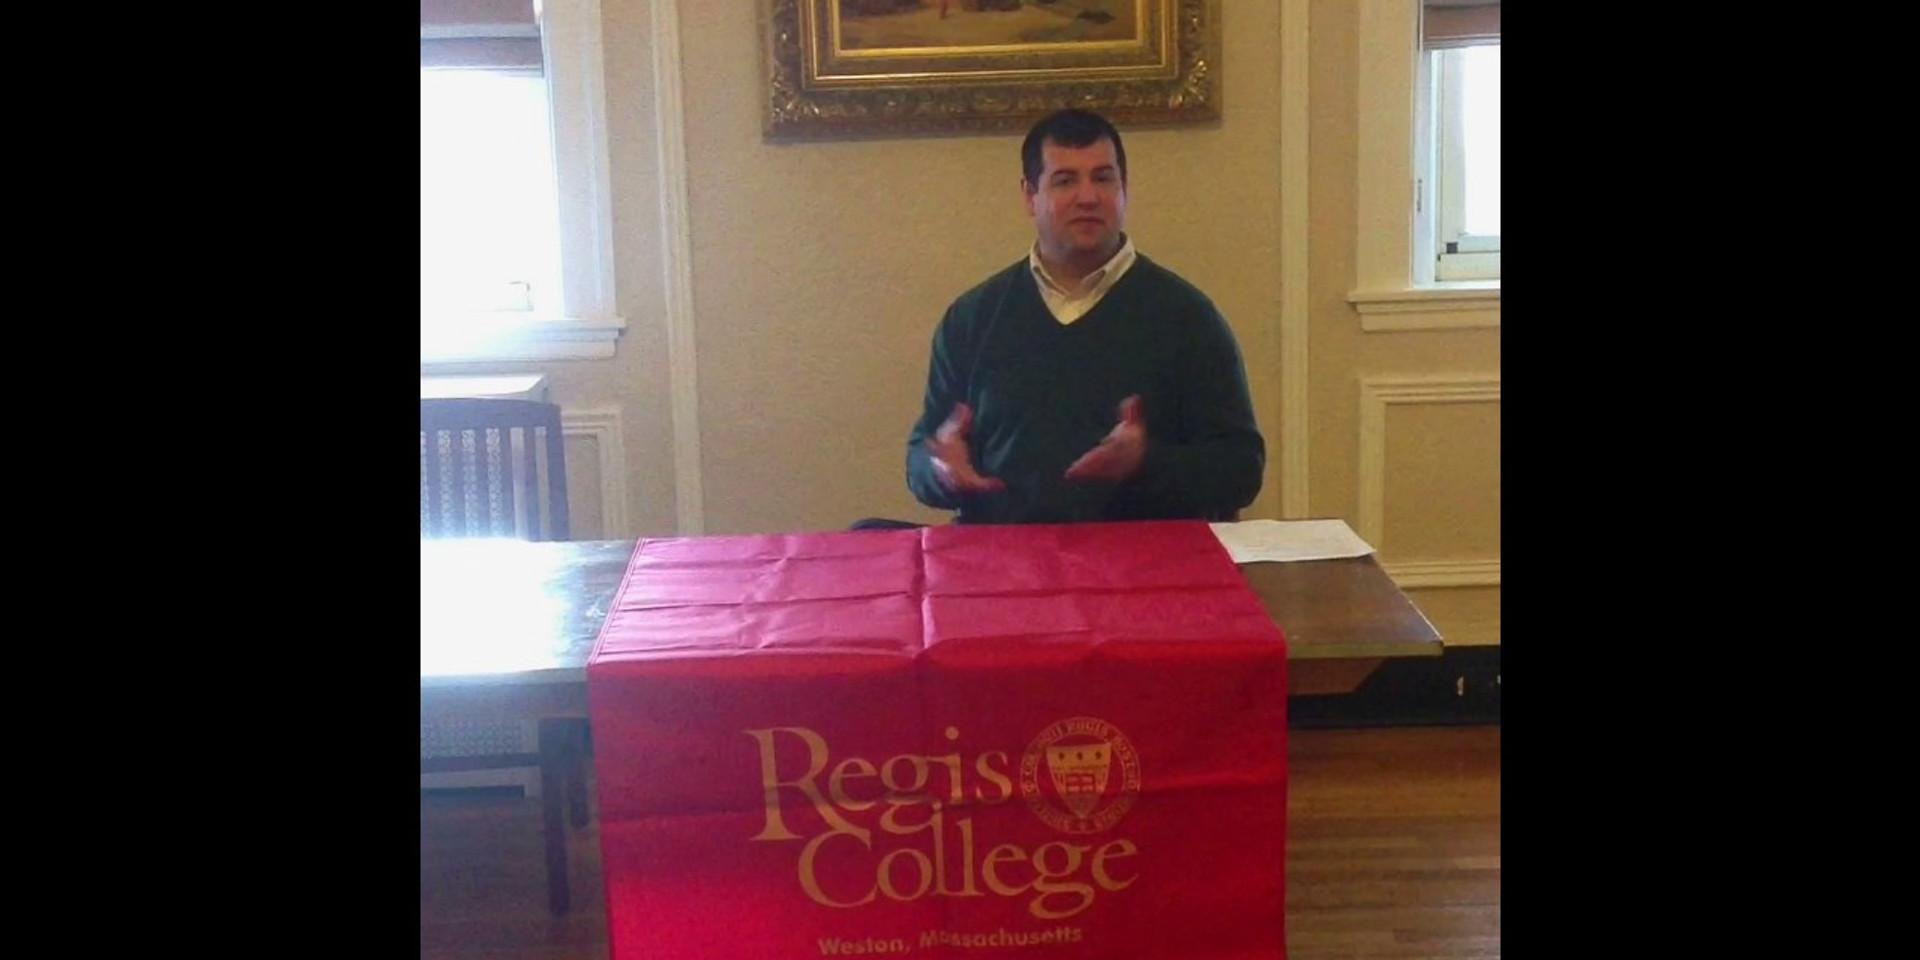 Regis Admission Application Deadline 2014